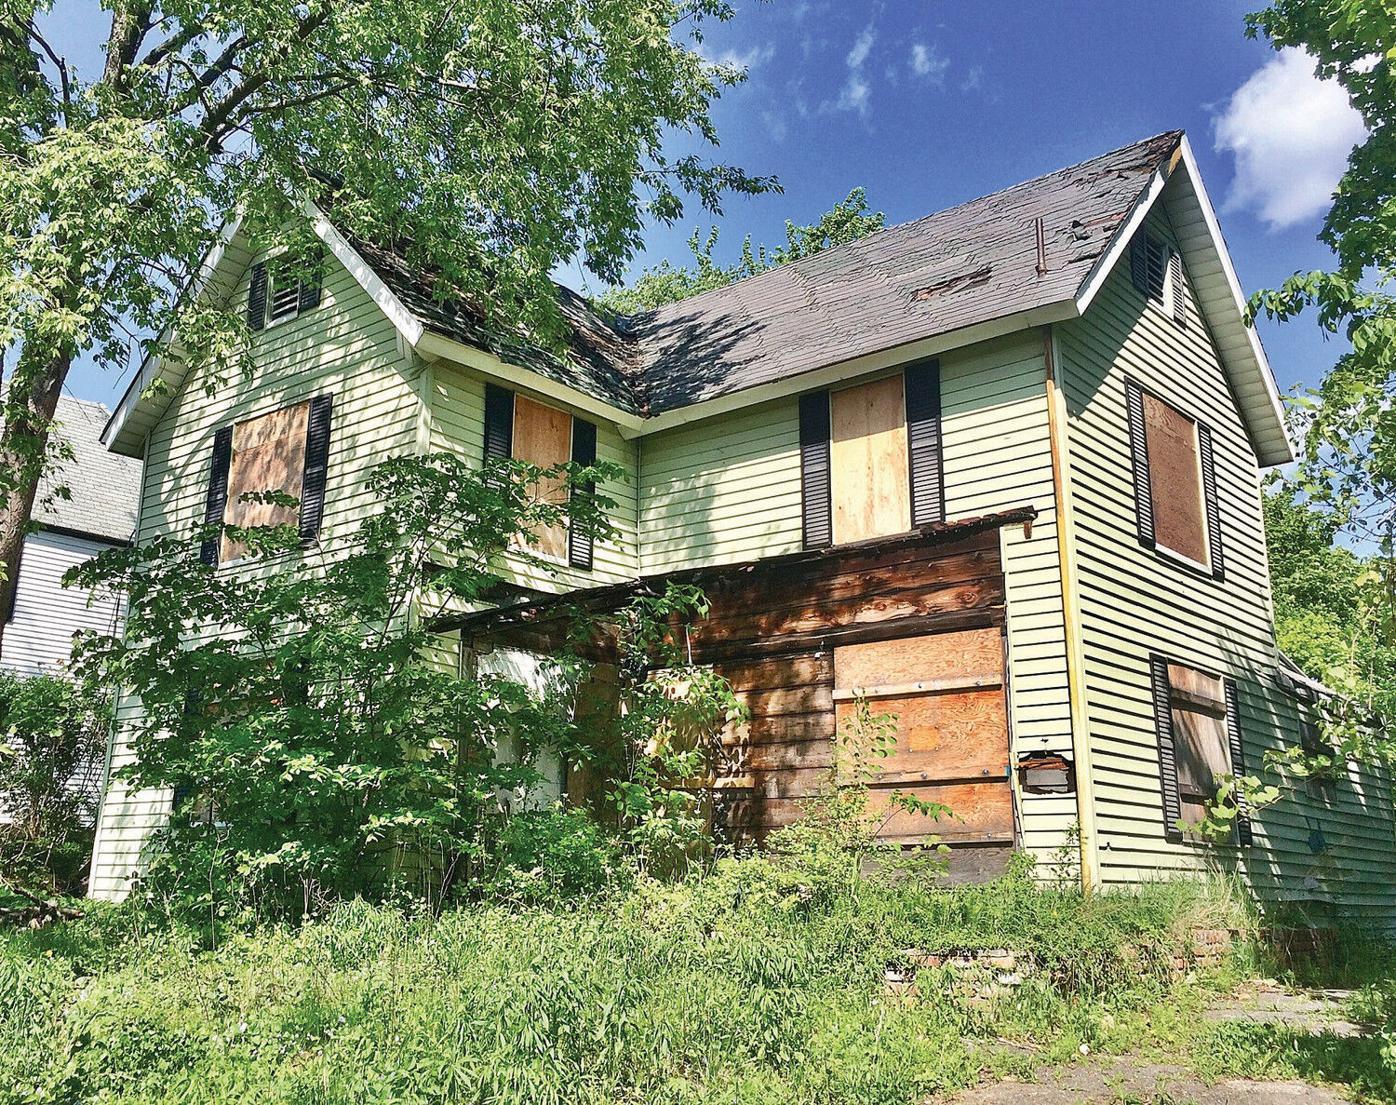 Pittsfield renews battle against blight; four properties to be razed